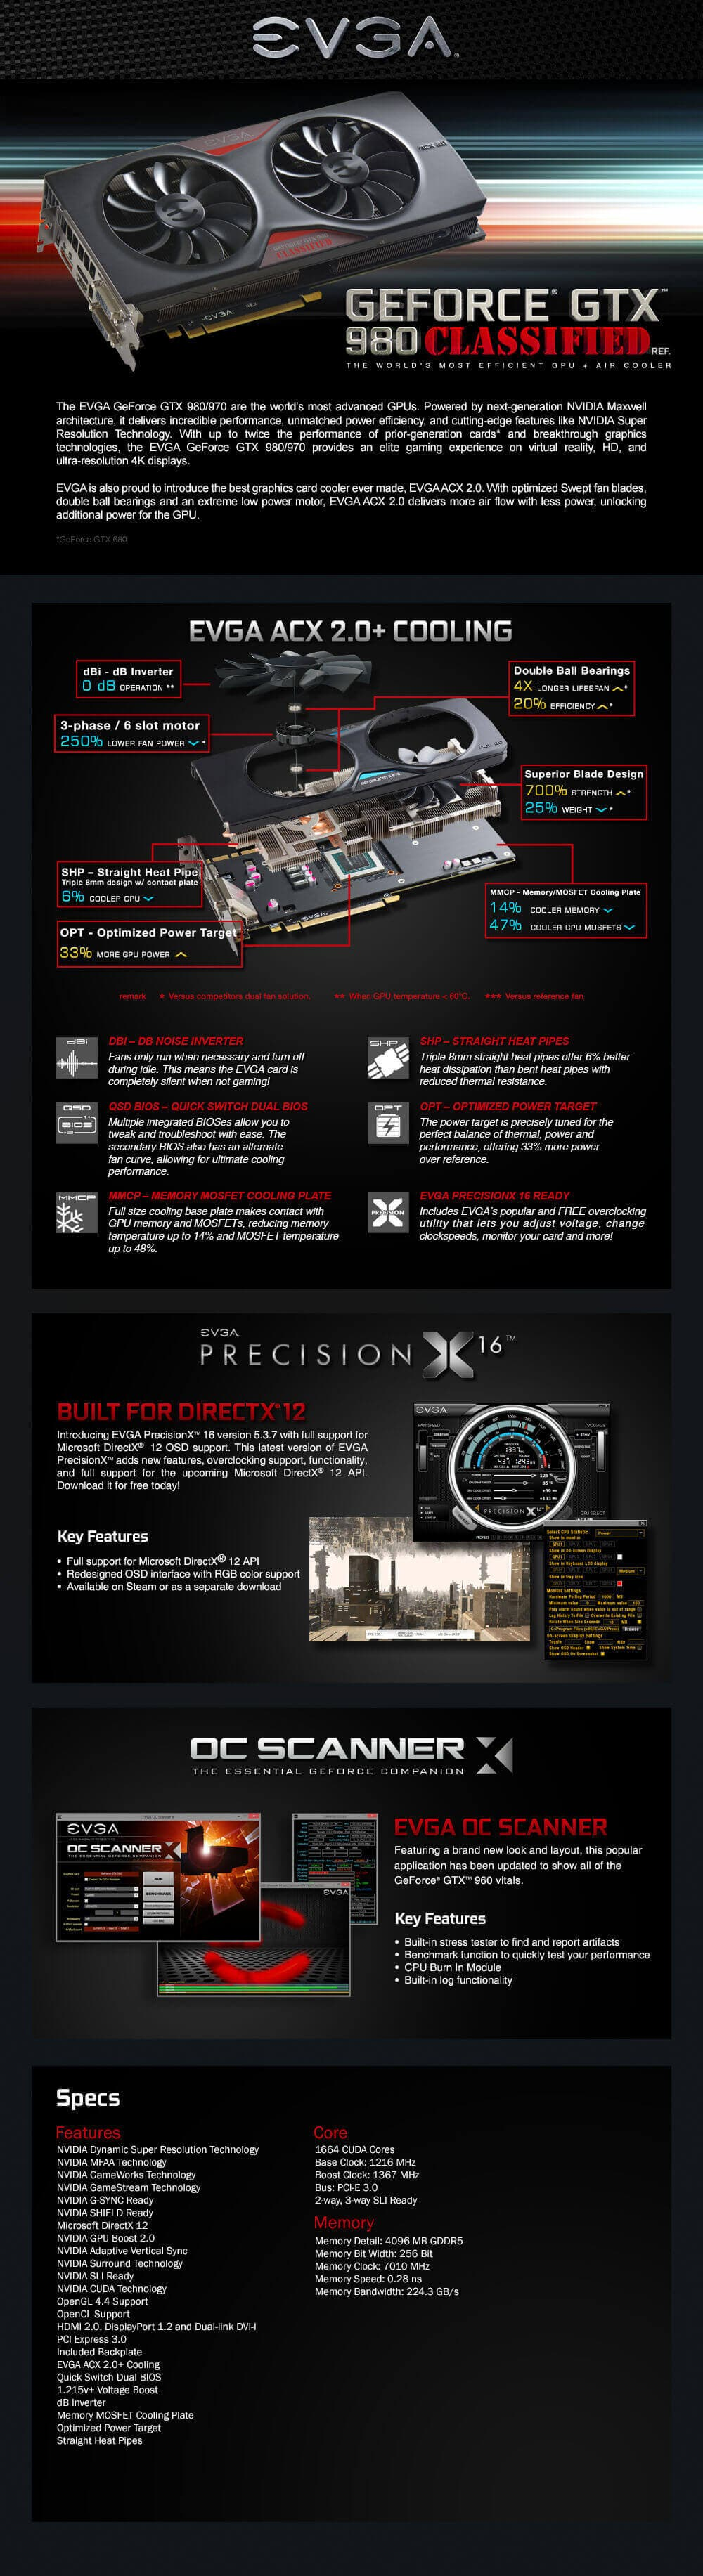 EVGA GeForce GTX 980 Classified